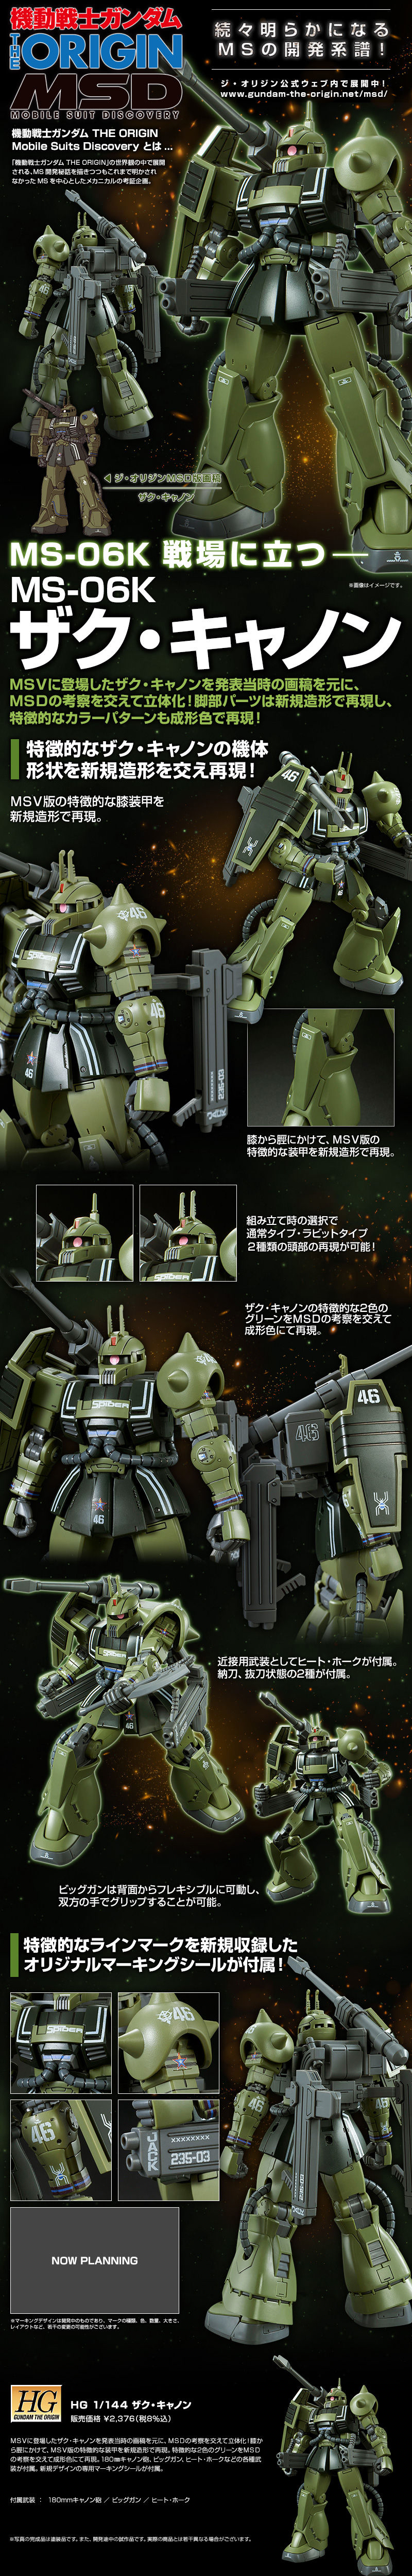 HG 1/144 MS-06K ザク・キャノン [Zaku Cannon] 公式商品説明(画像)